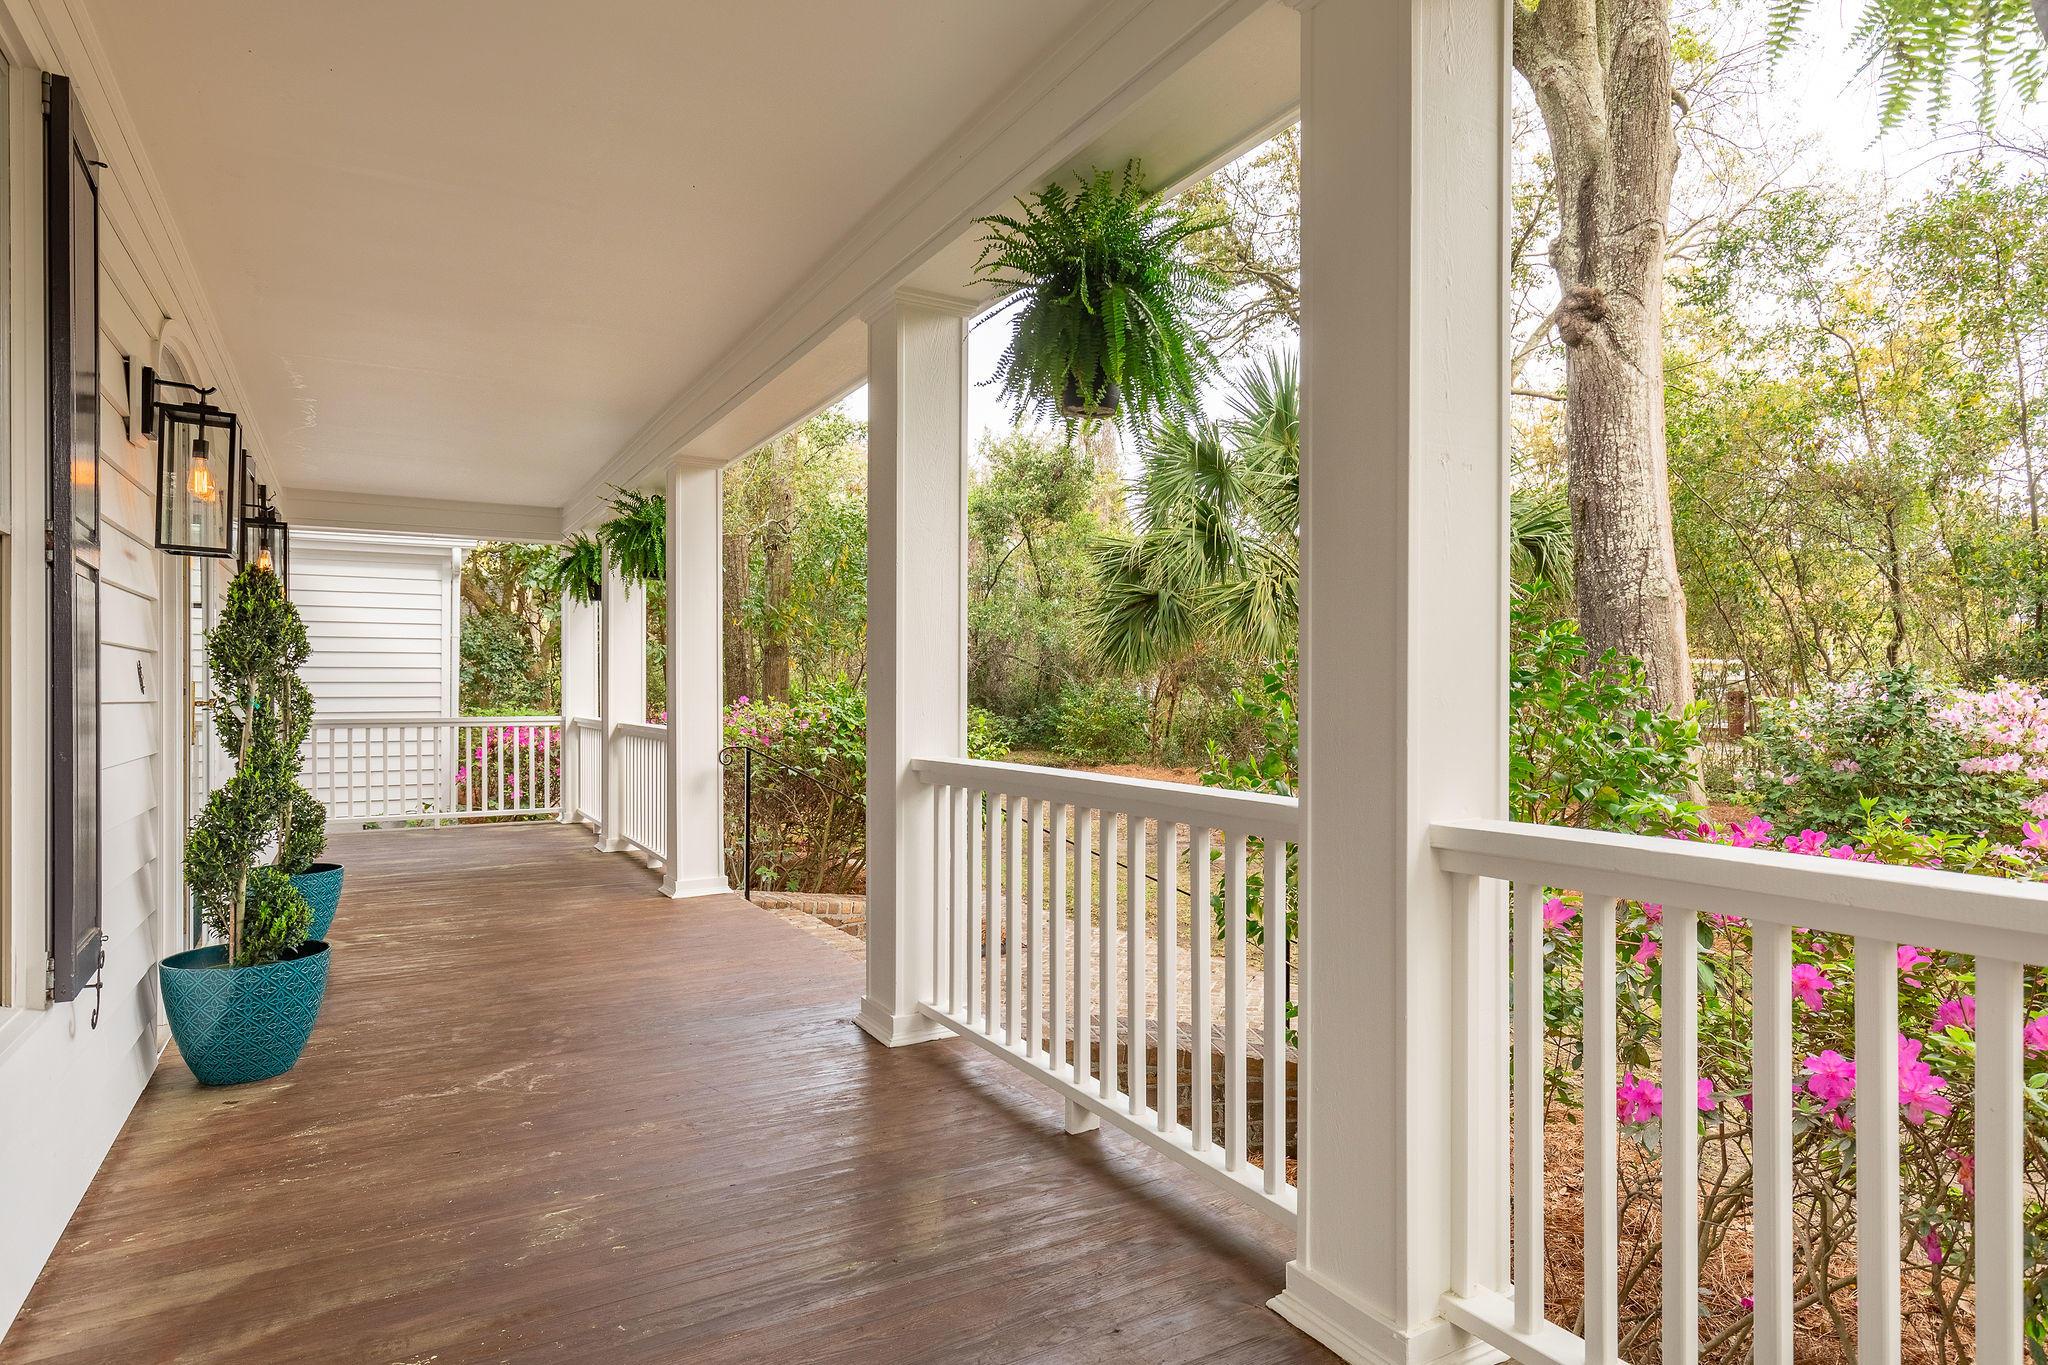 Old Mt Pleasant Homes For Sale - 1417 Edwards, Mount Pleasant, SC - 55